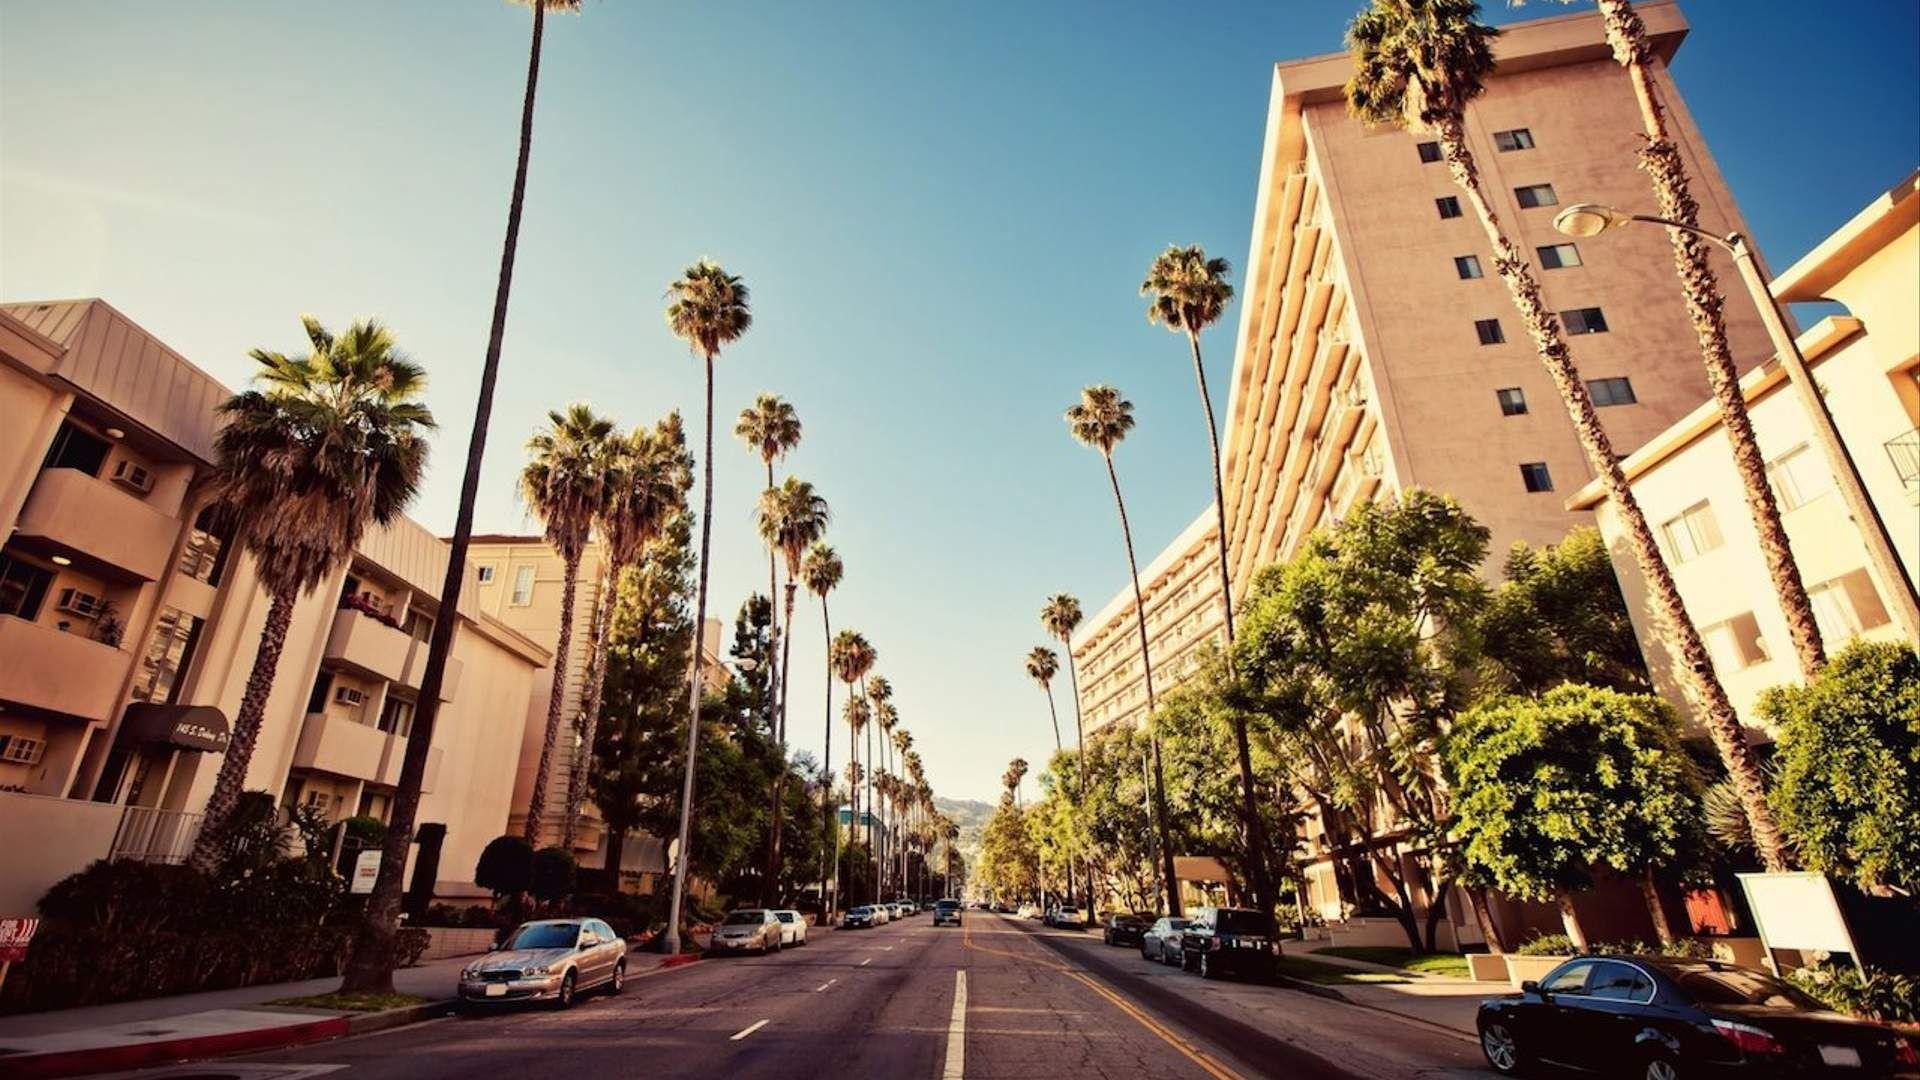 Beverly Hills download wallpaper image